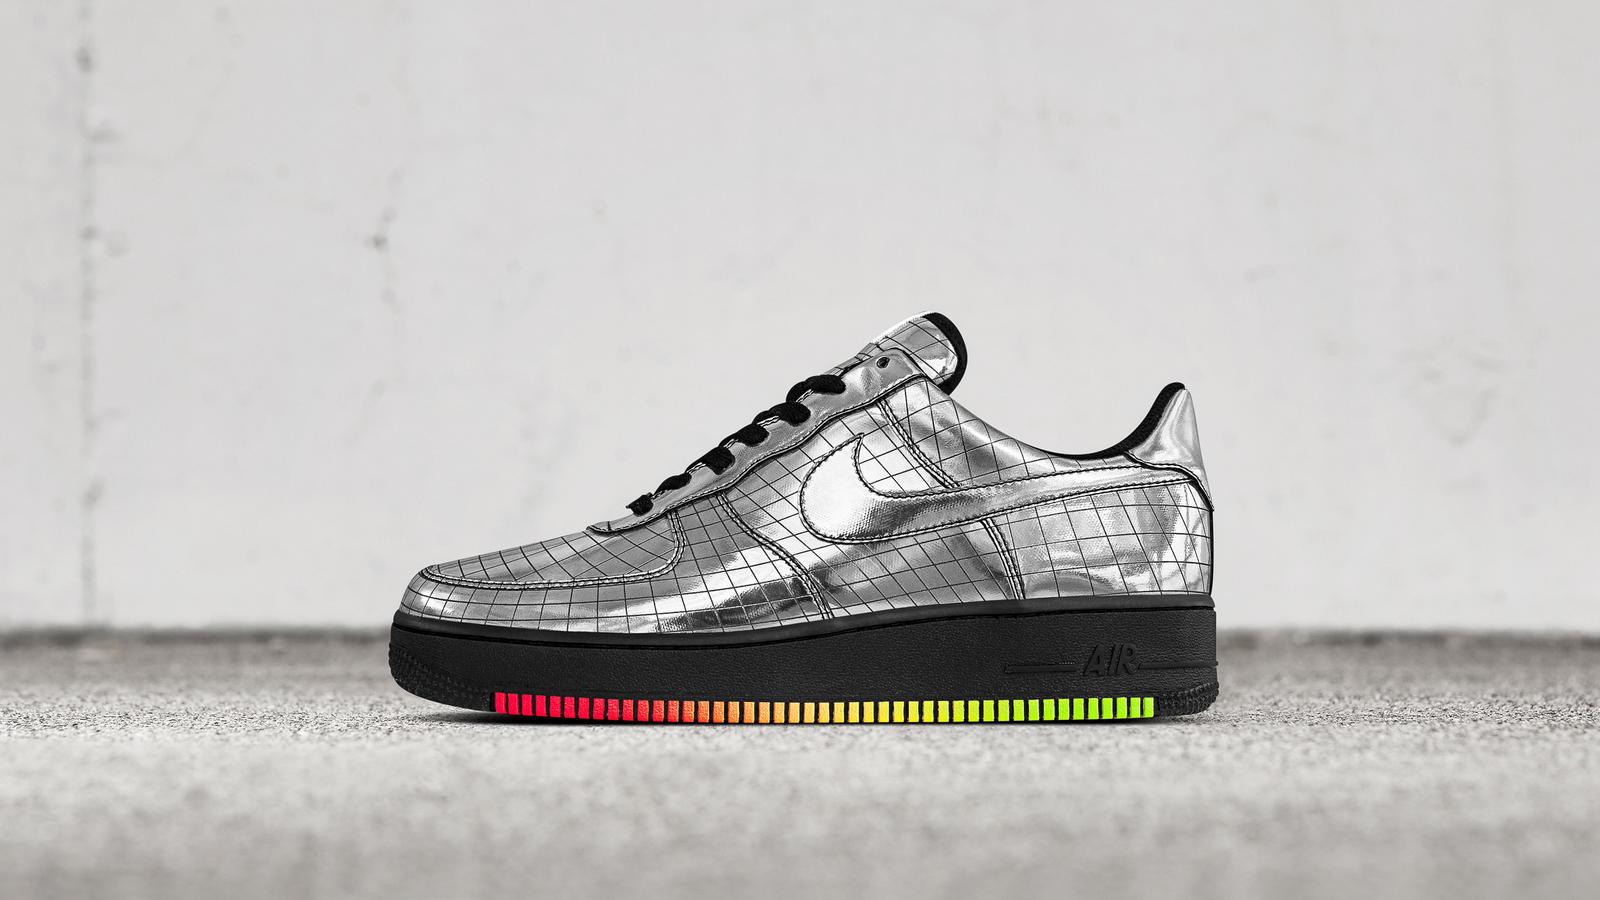 Nike Creates Special Sneaker for Elton